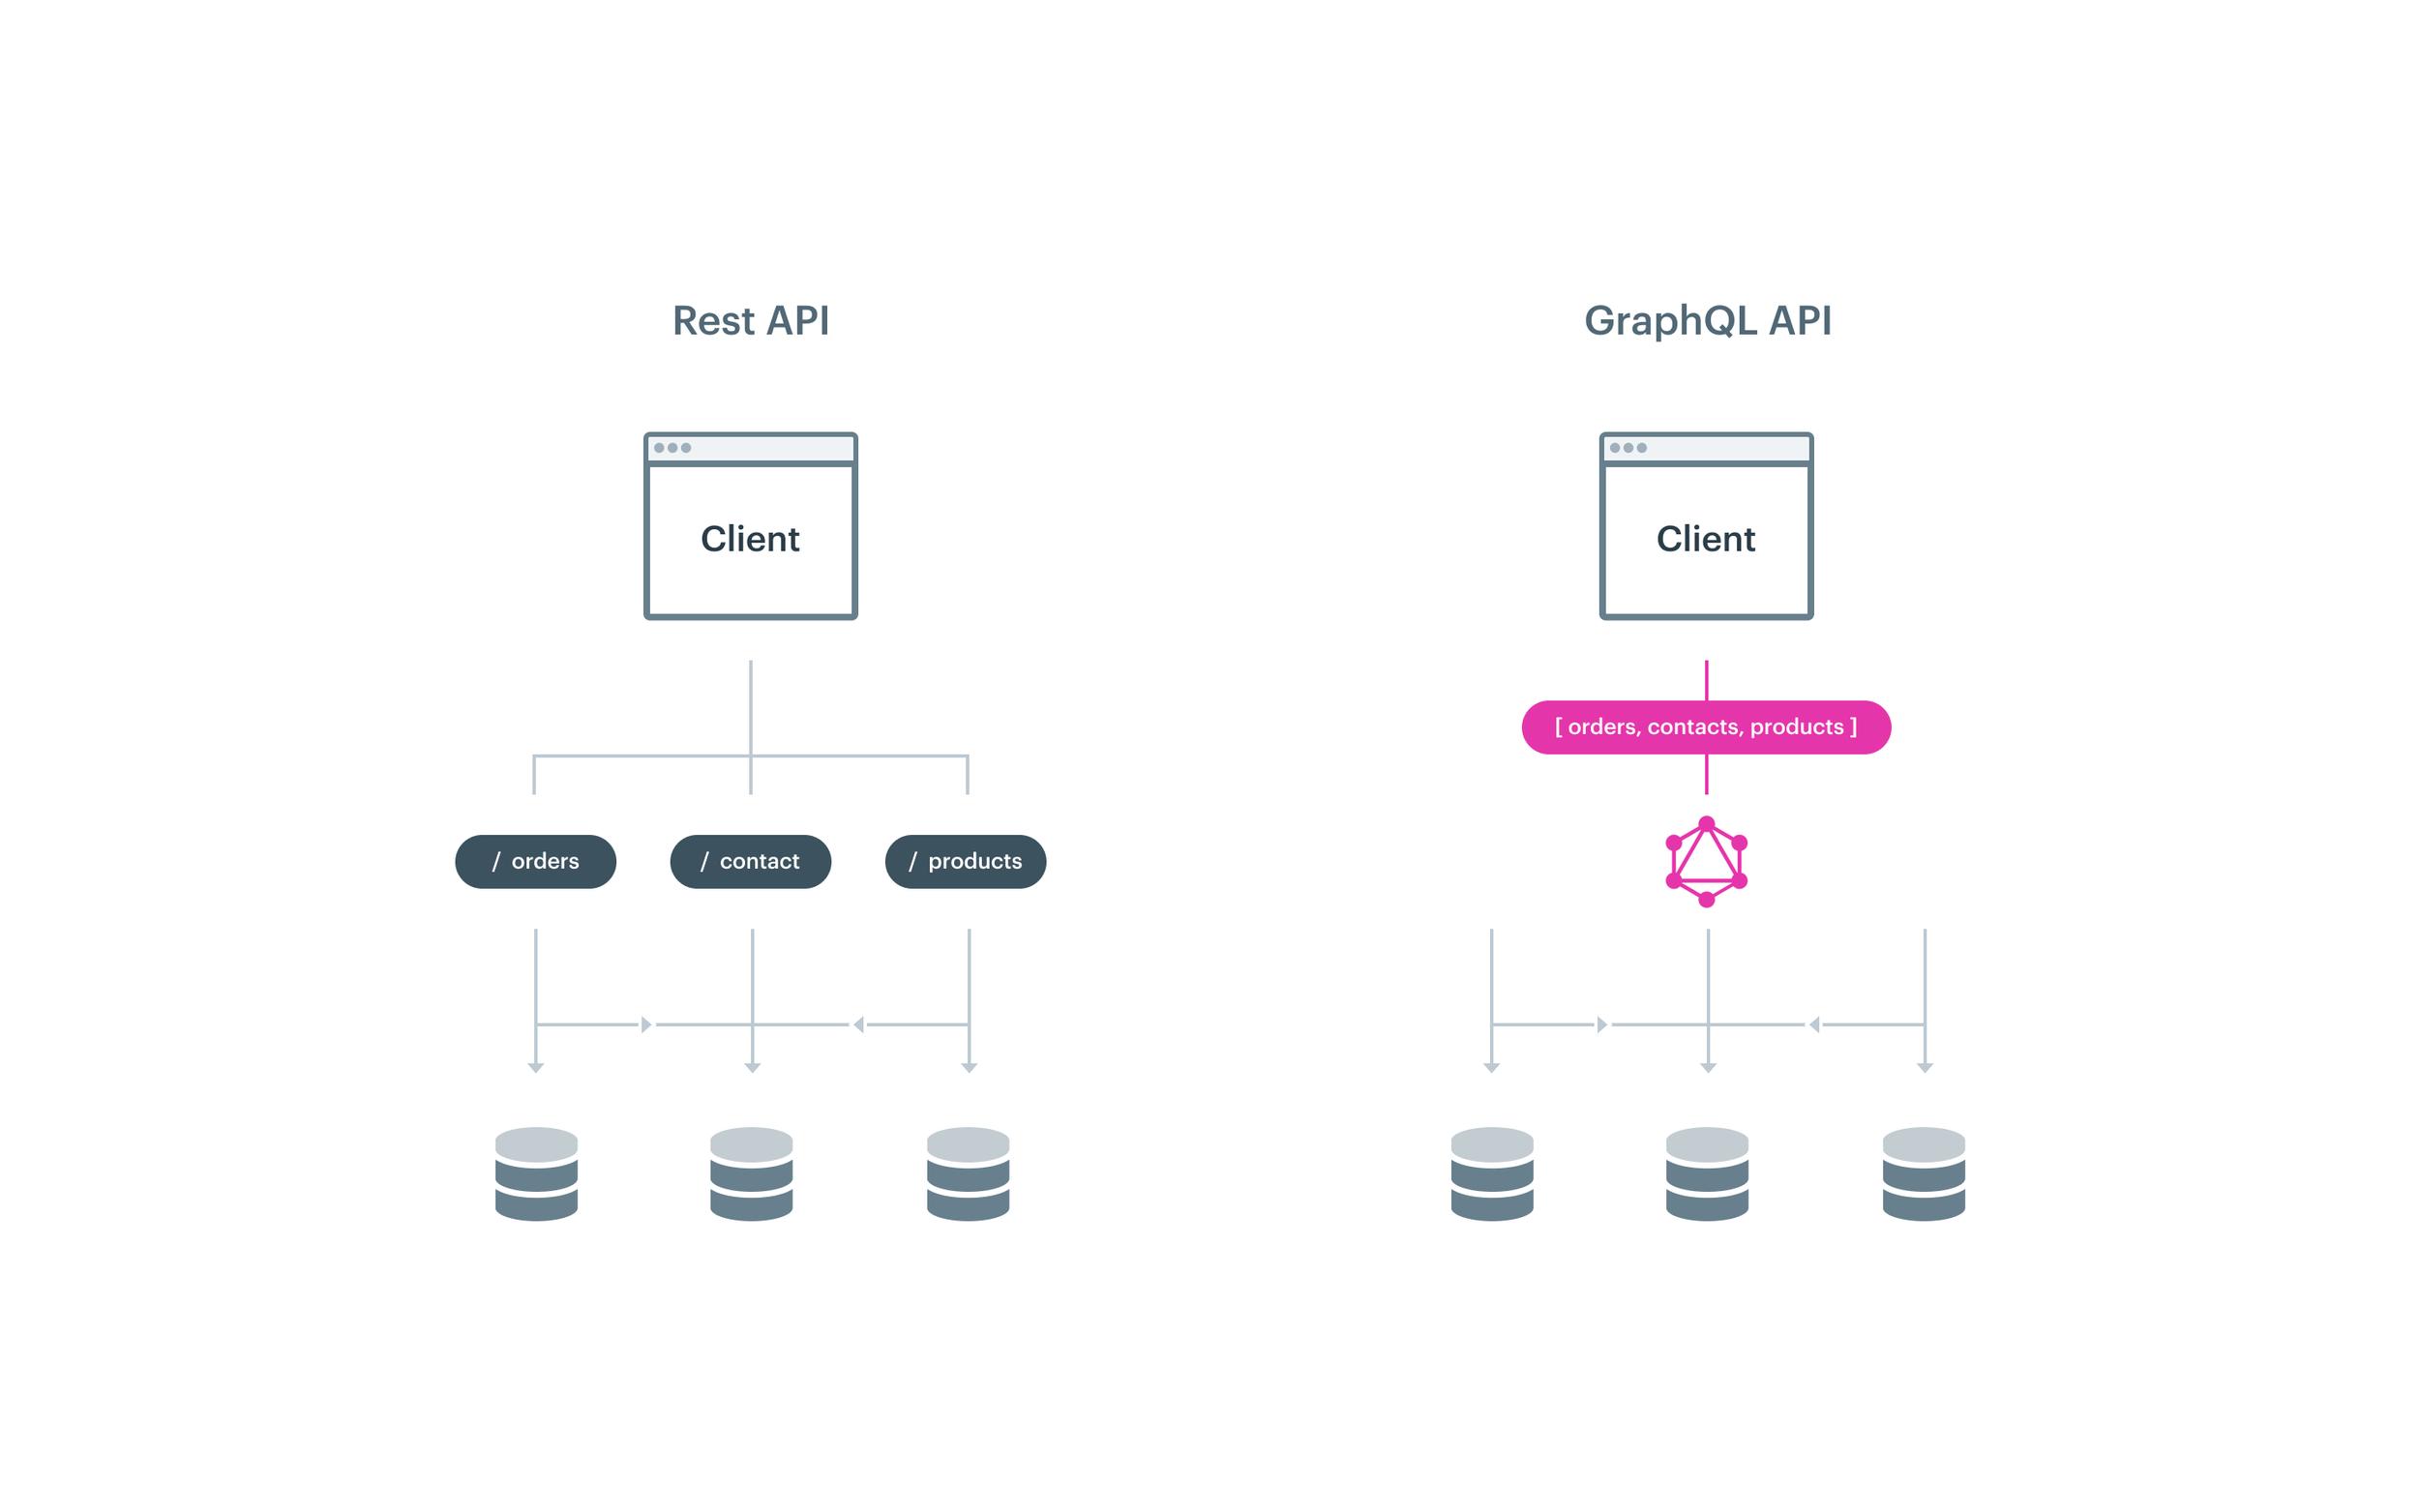 GraphQL API vs Rest API